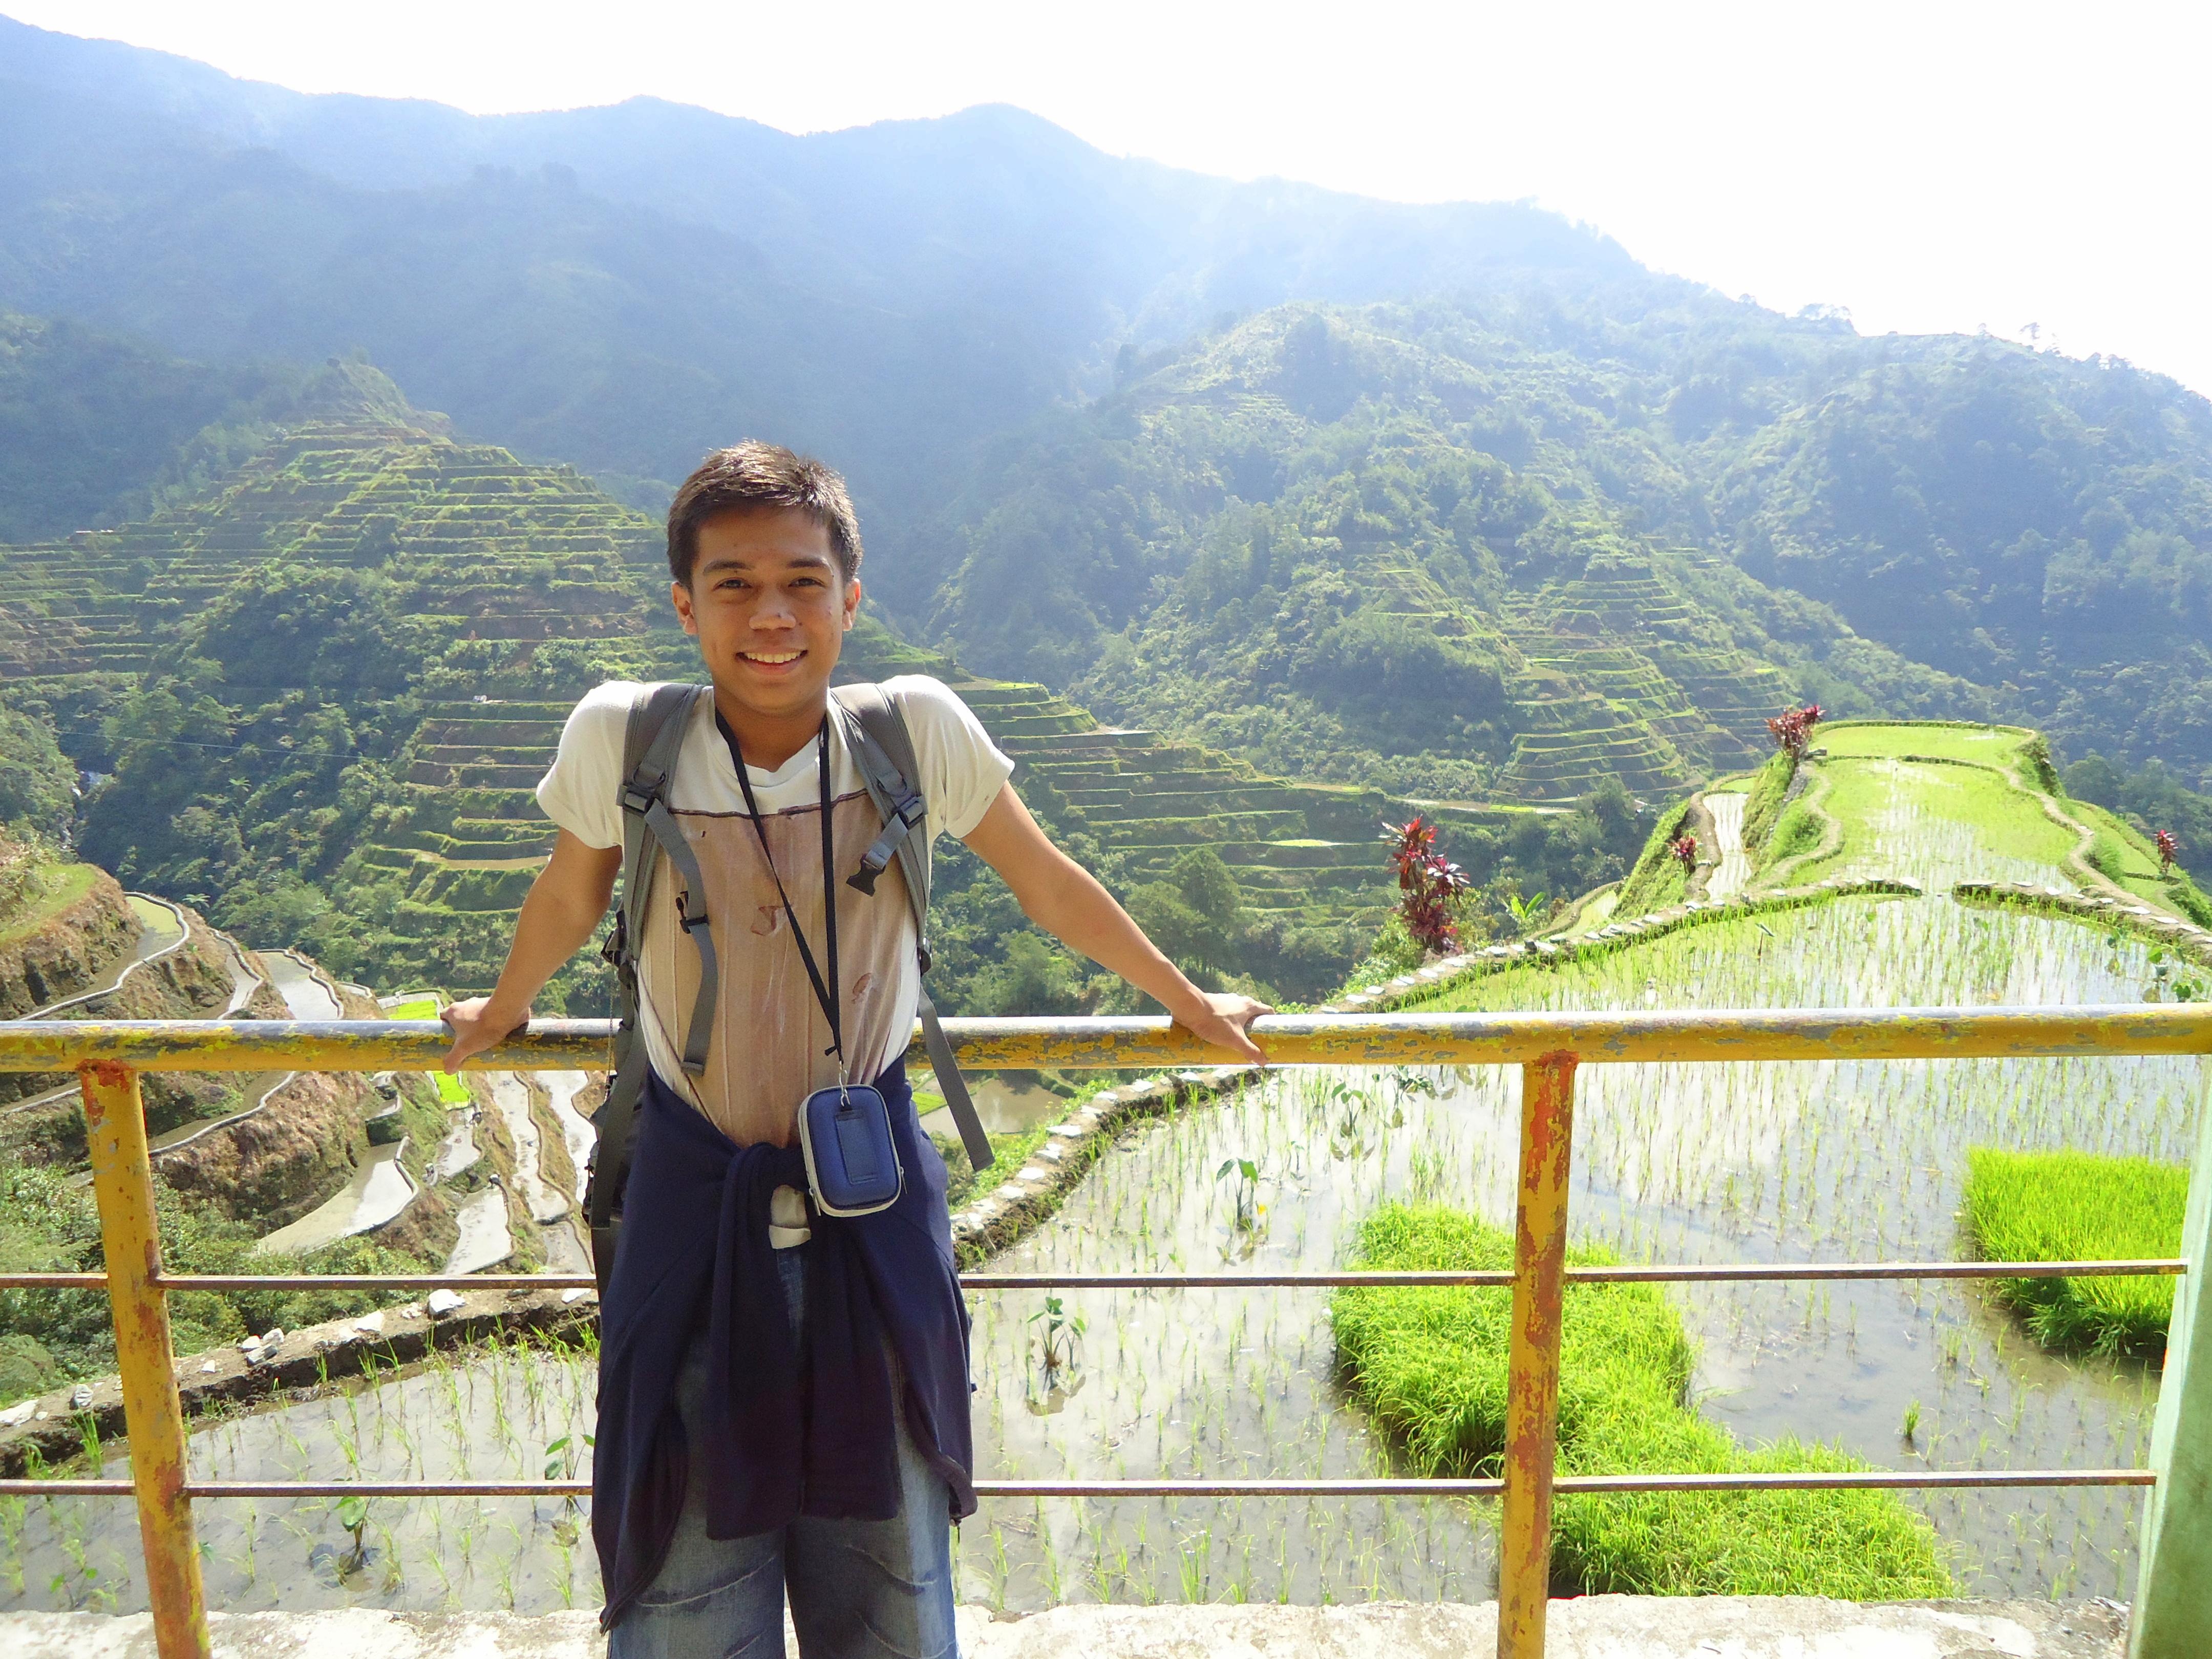 Rice Terraces of the Cordilleras Rice Terraces of the Philippine Cordilleras - Philippines carlos ortiz